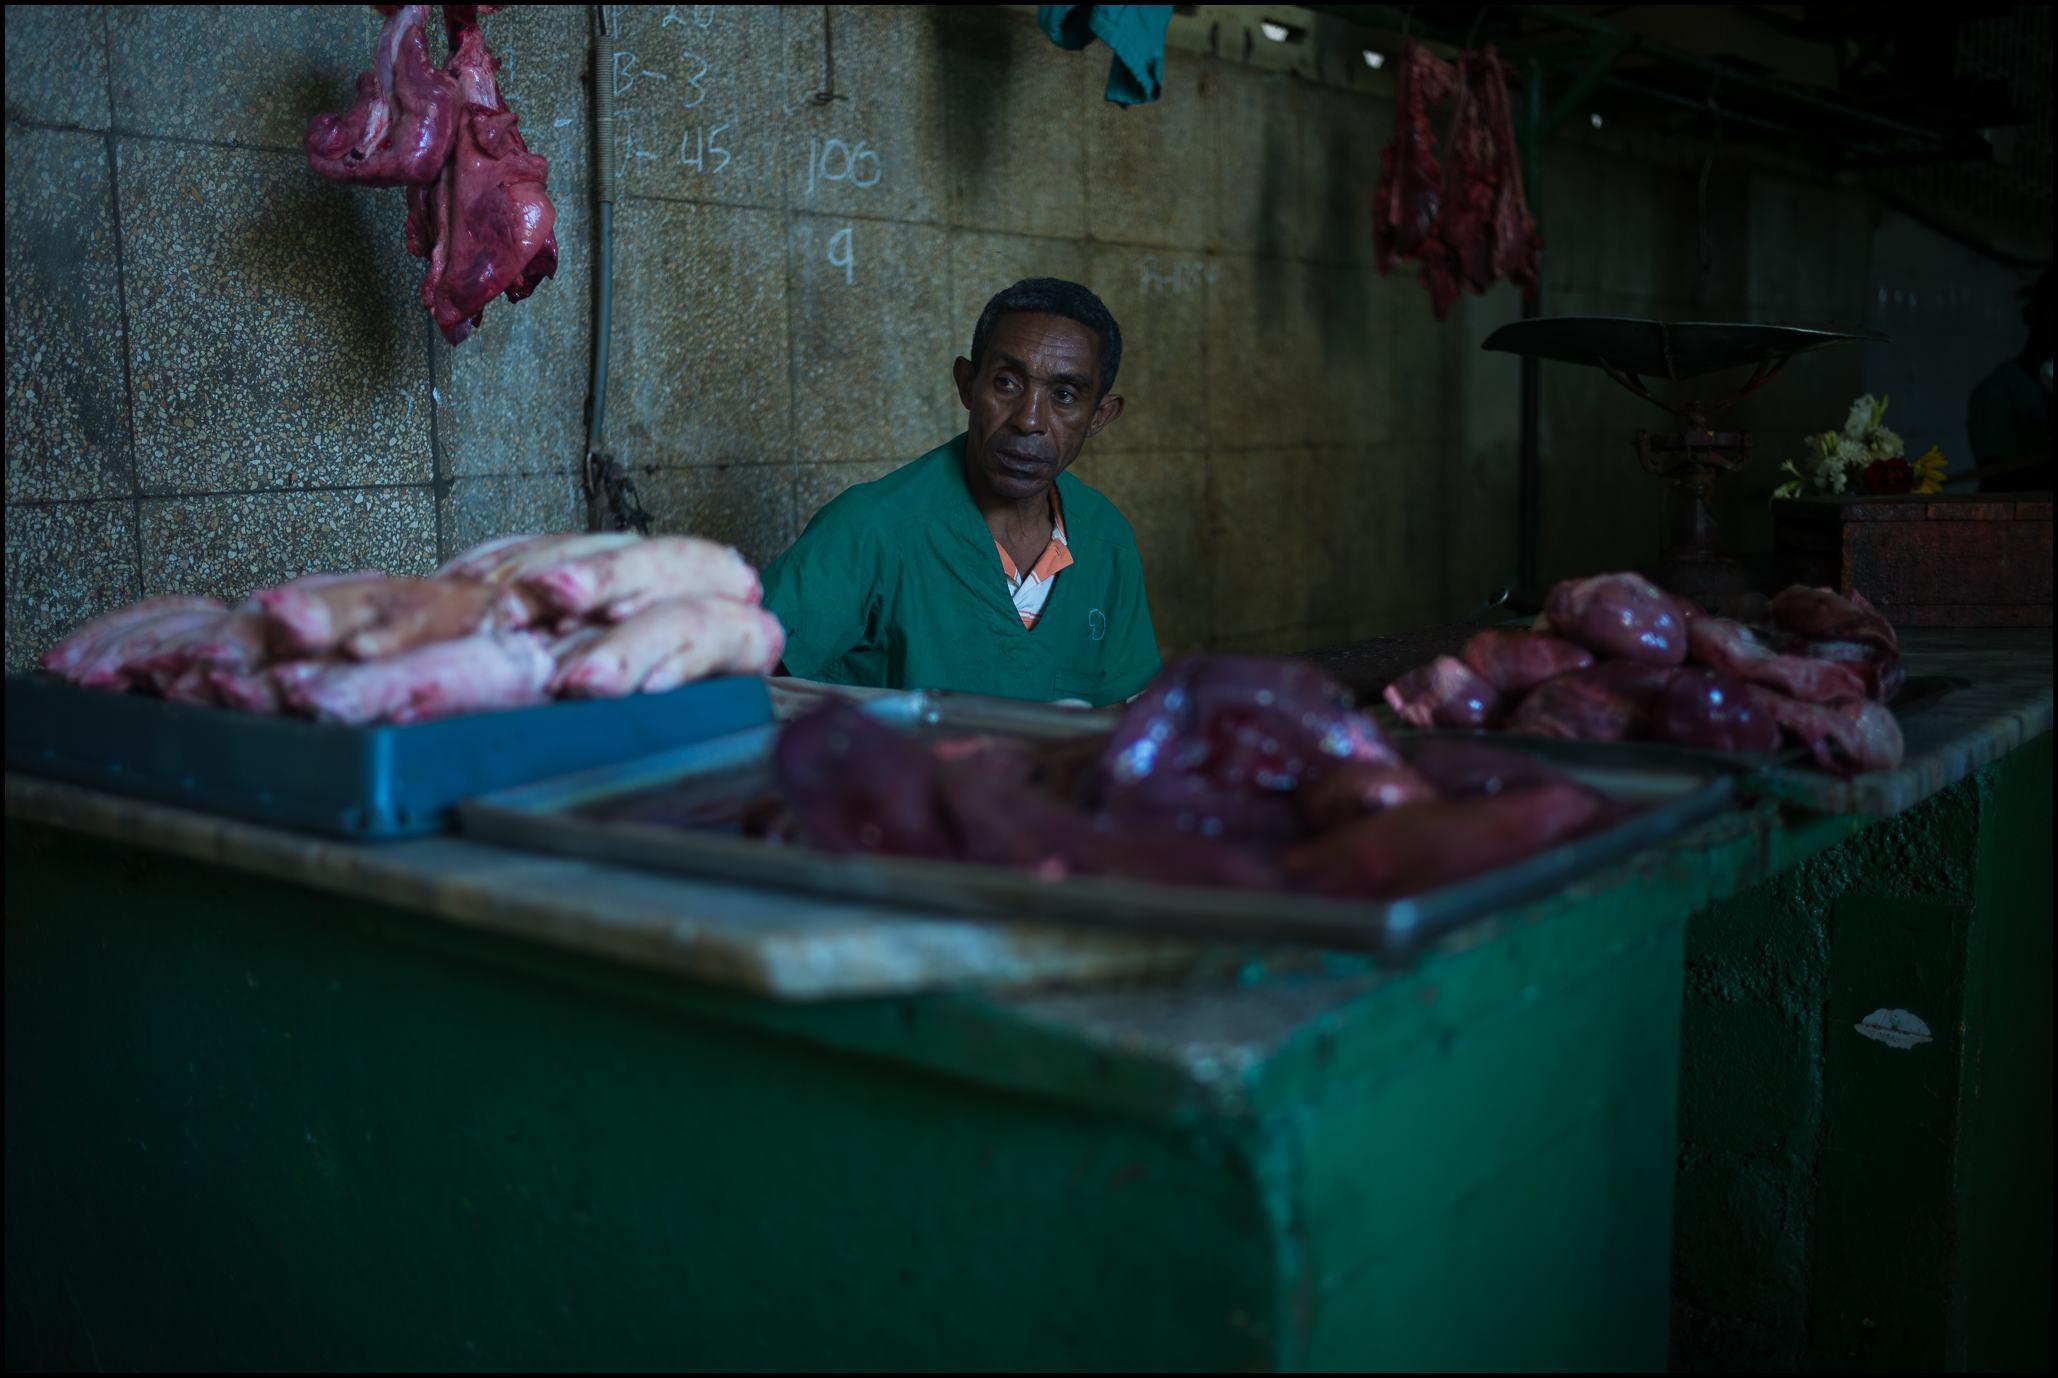 Meat Vendor, Egido Market, Havana